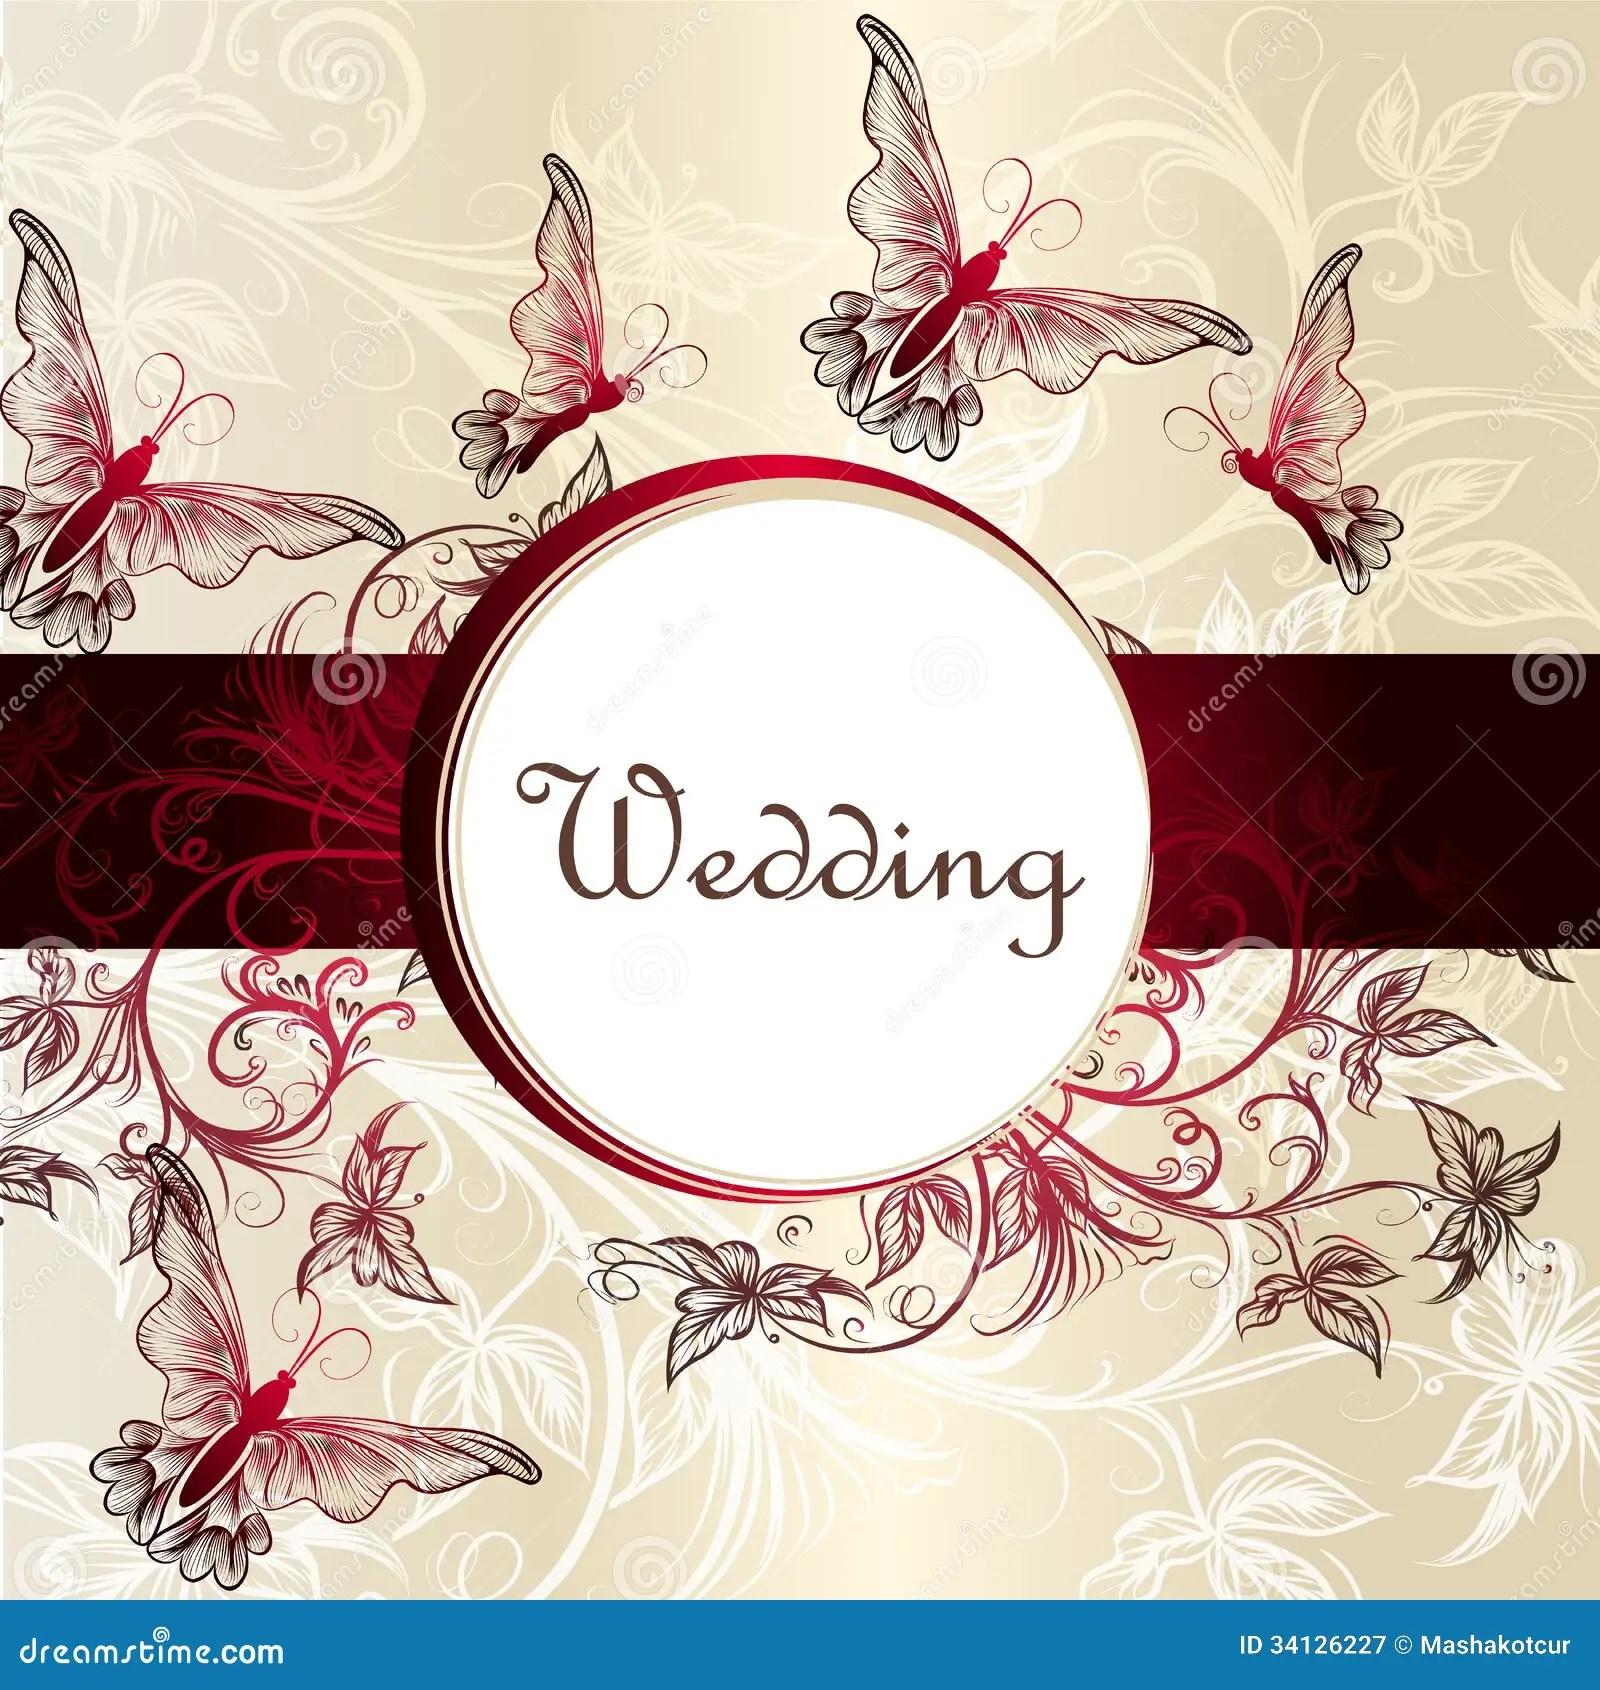 Download Invitation Card wedding invitation templates free – Download Invitation Card